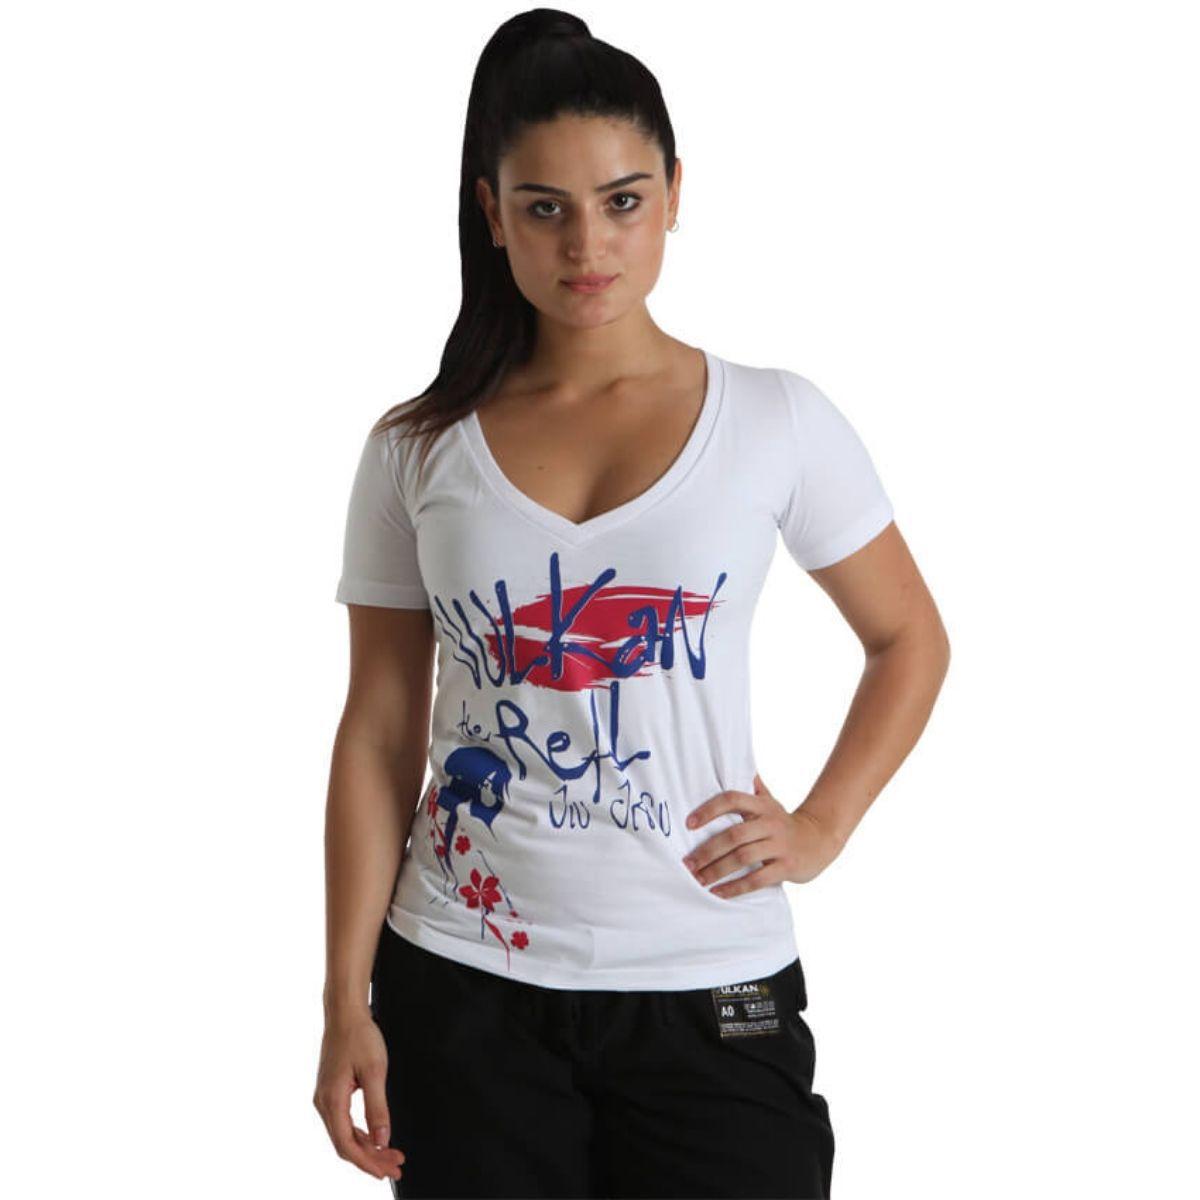 Camiseta Camisete Feminina Manga Curta Branca Tamanho G - Vulkan Jiu Jitsu